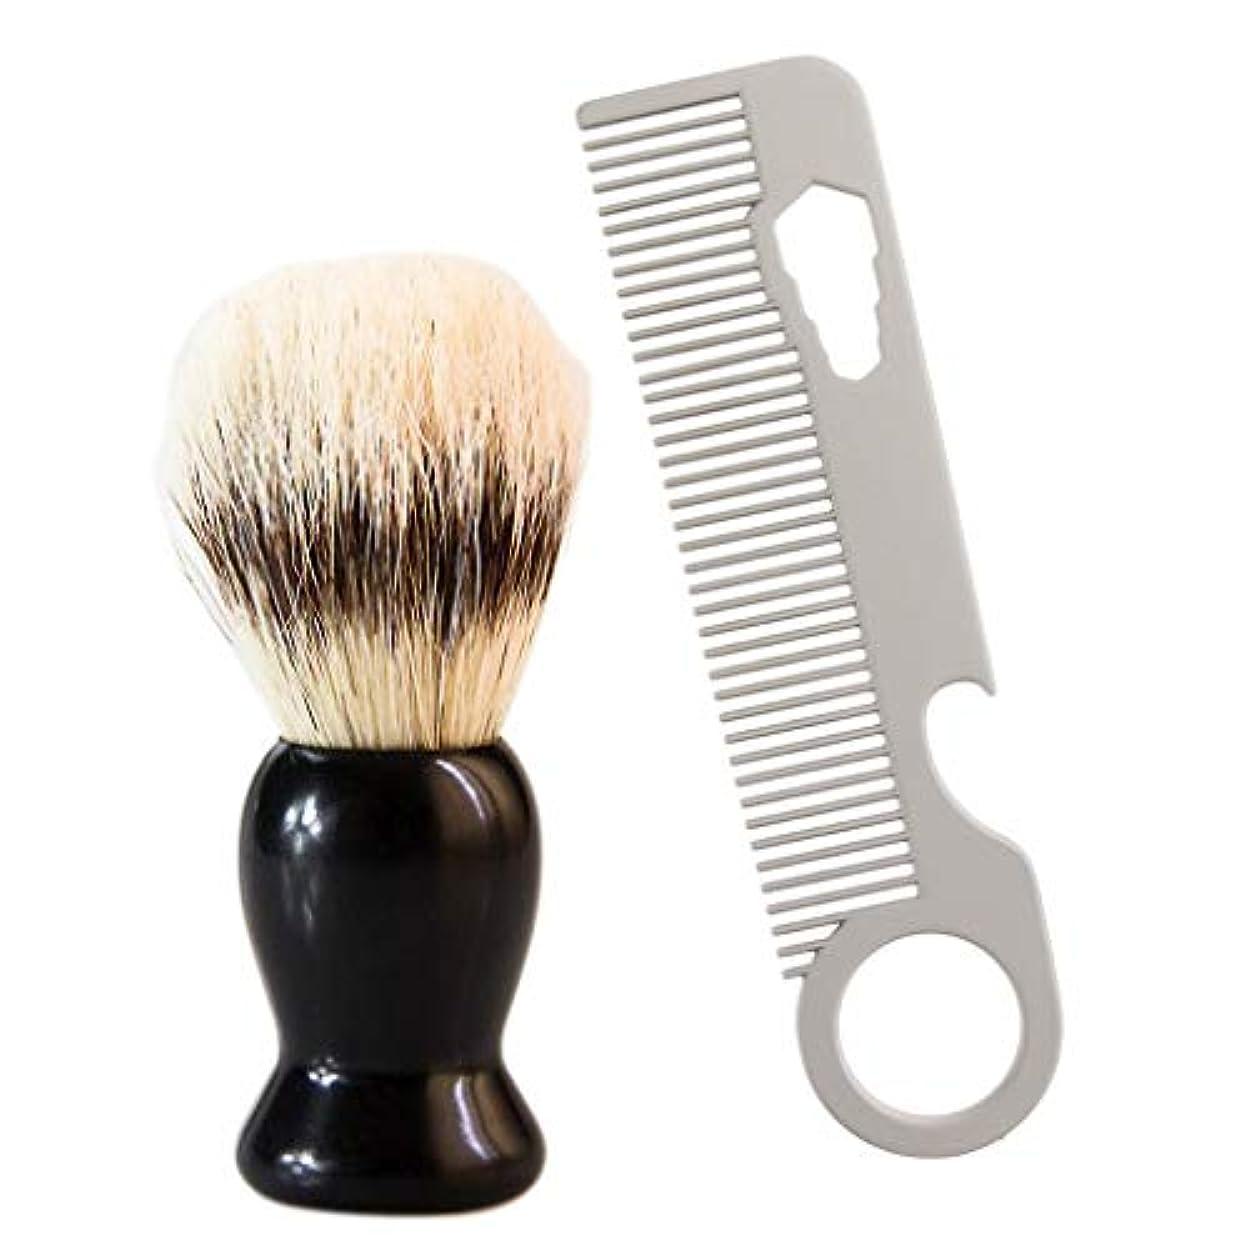 Hellery メンズ シェービングブラシセット ひげ剃り櫛 理容 洗顔 髭剃り 家庭用 旅行 贈り物